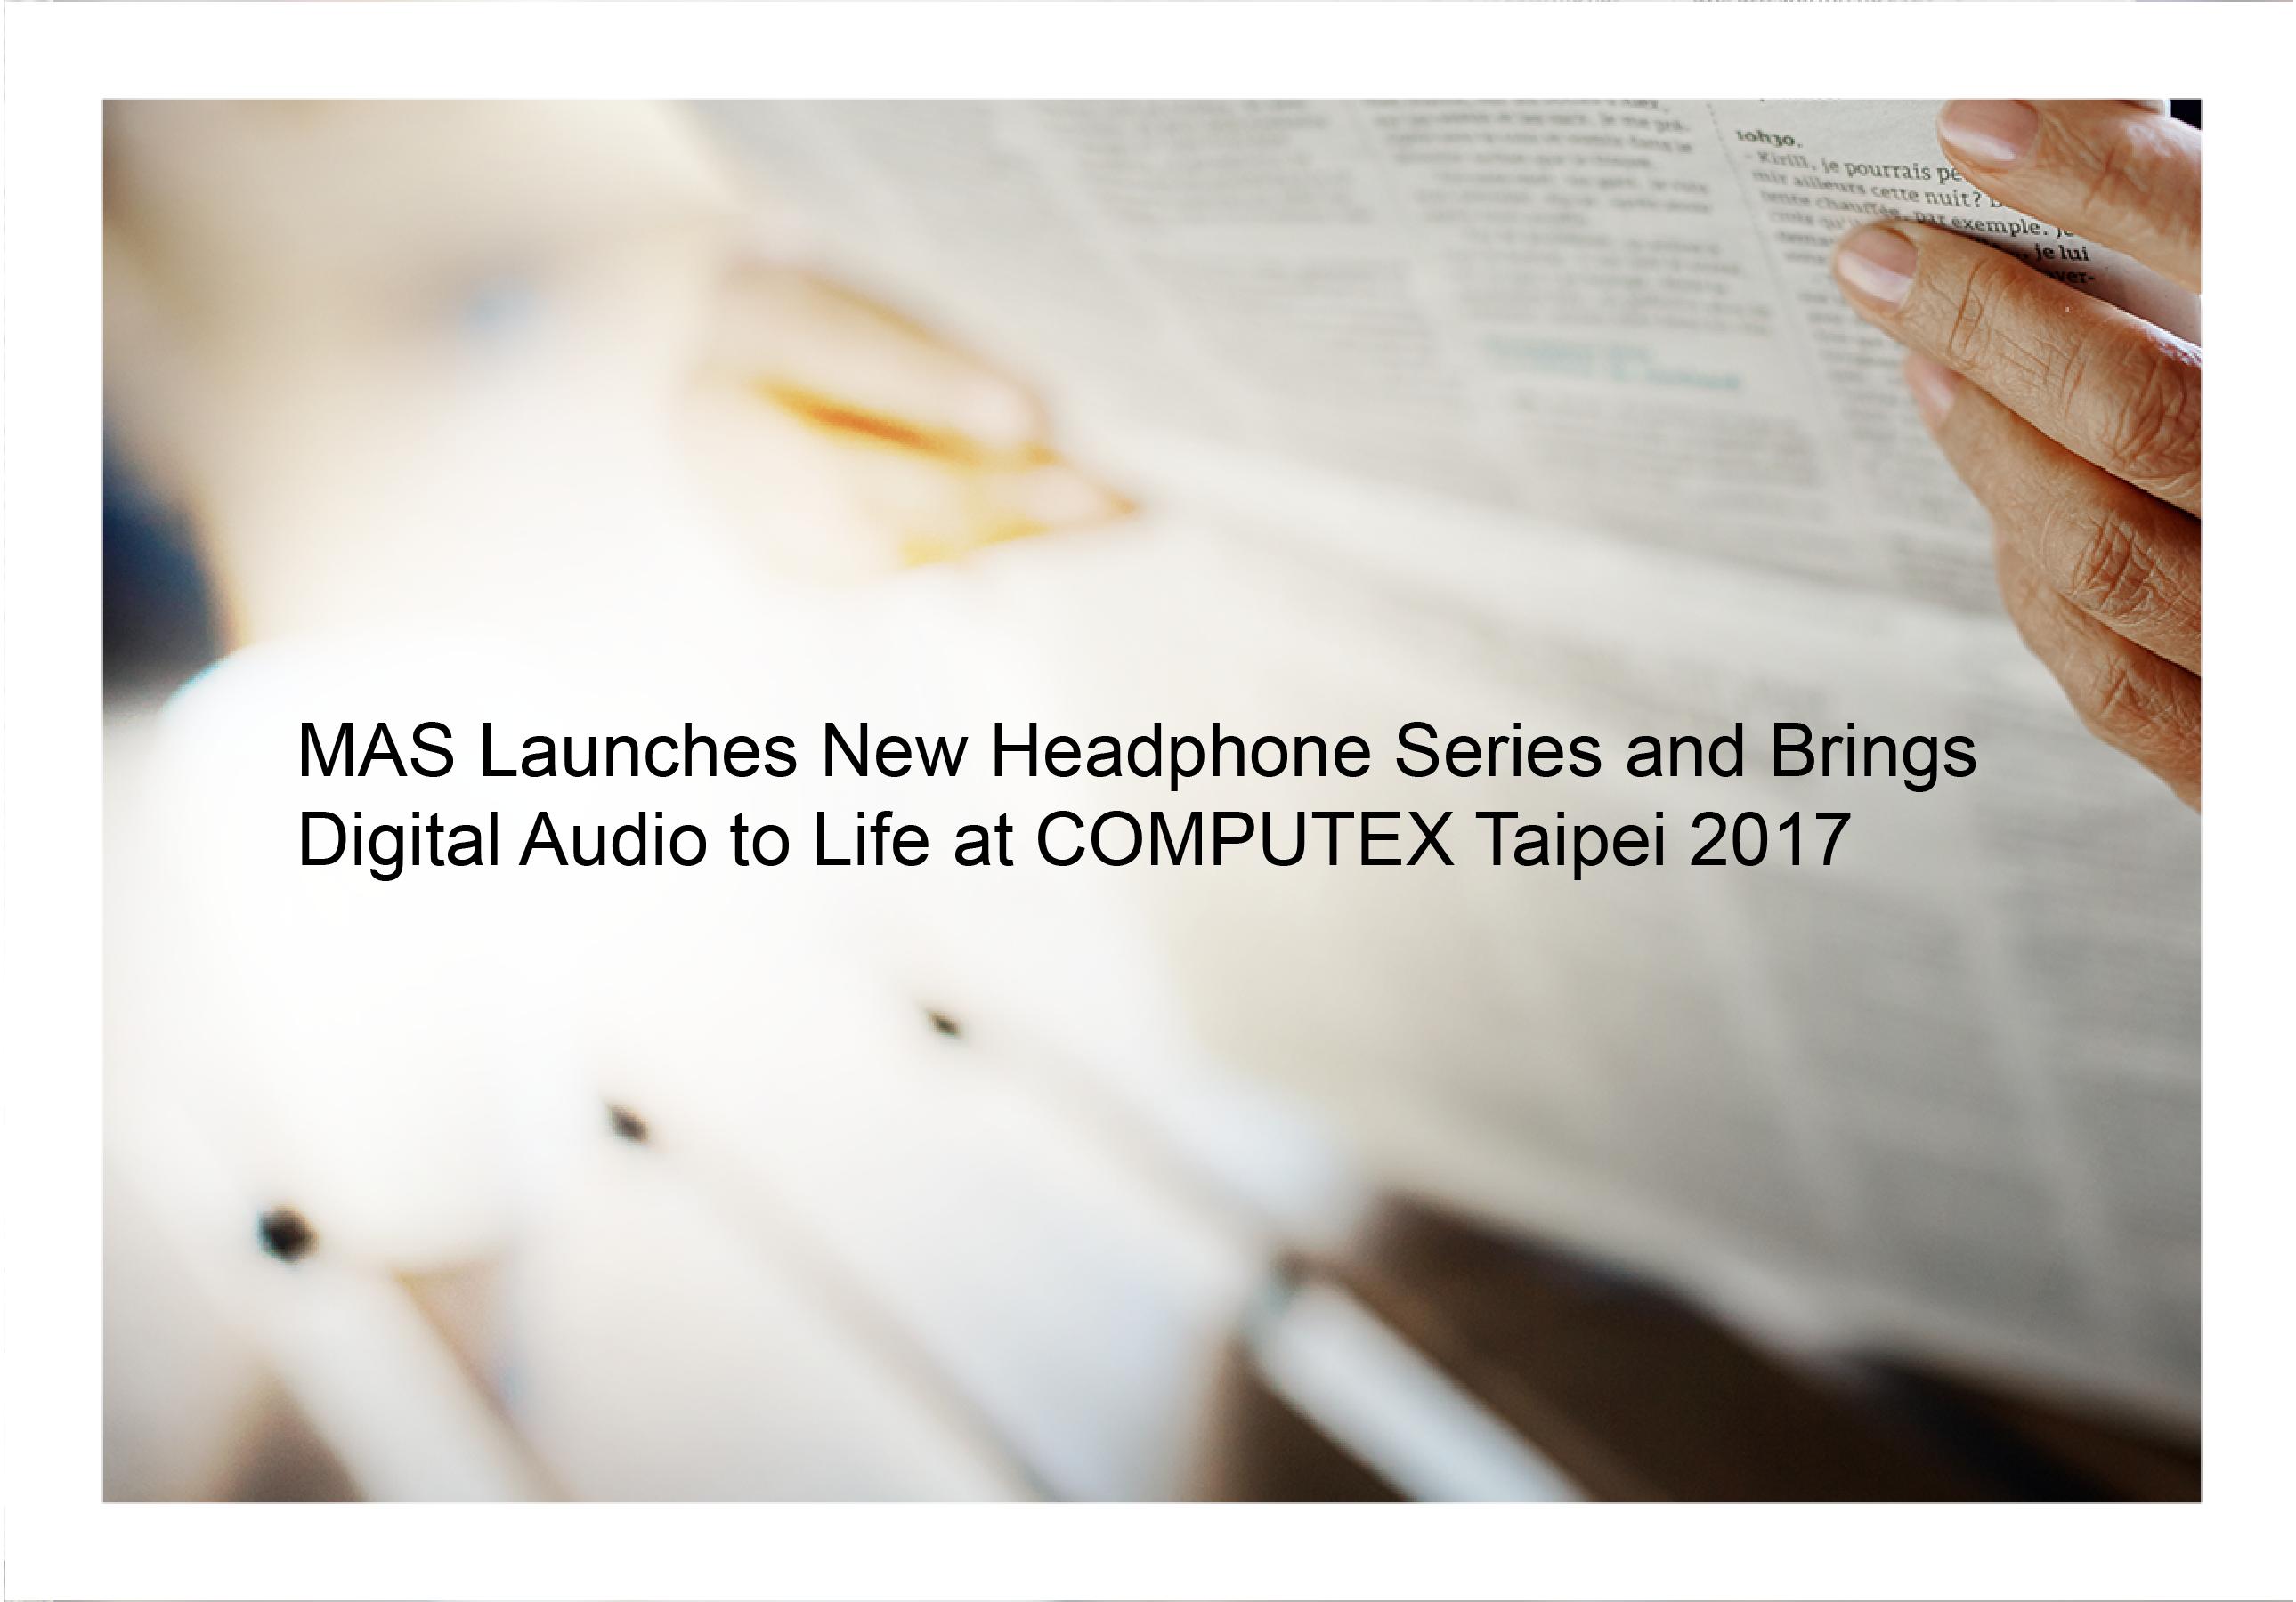 MAS AUDIO SCIENCE New Headphones Series and brings digital audio to life at computex taipei 2017